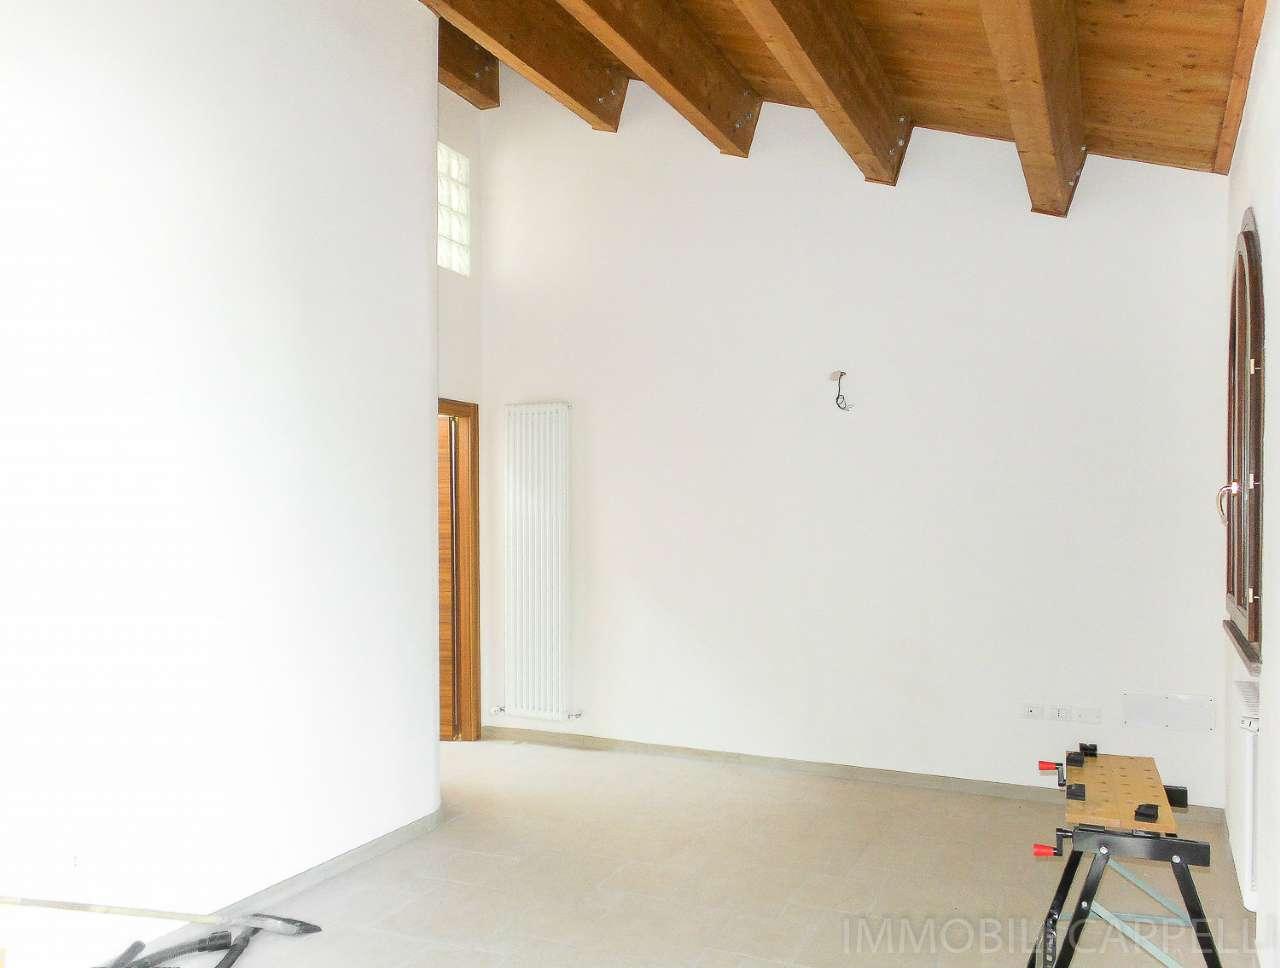 Forlimpopoli San Leonardo appartamento due camere in vendita